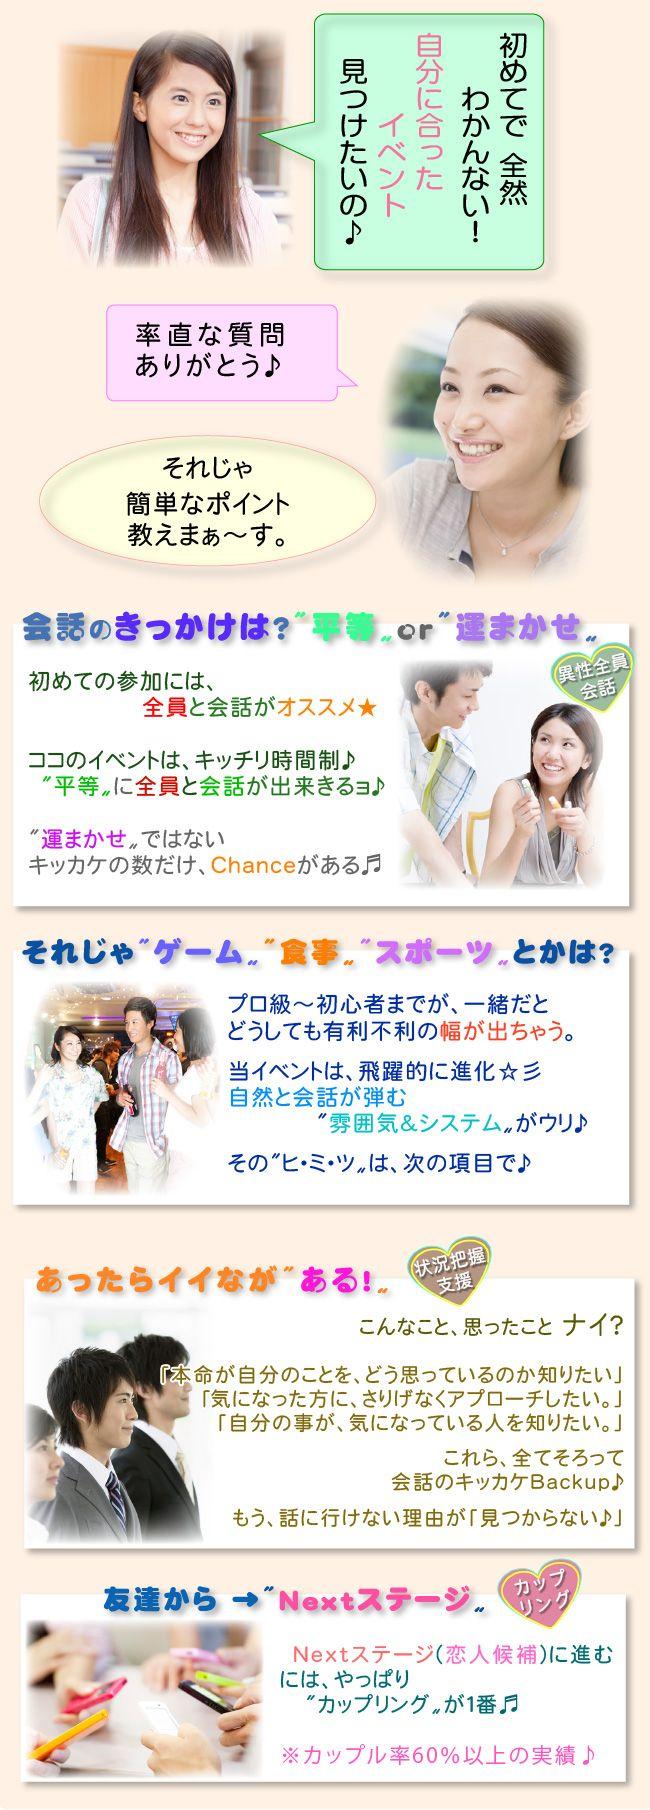 Top-説明09